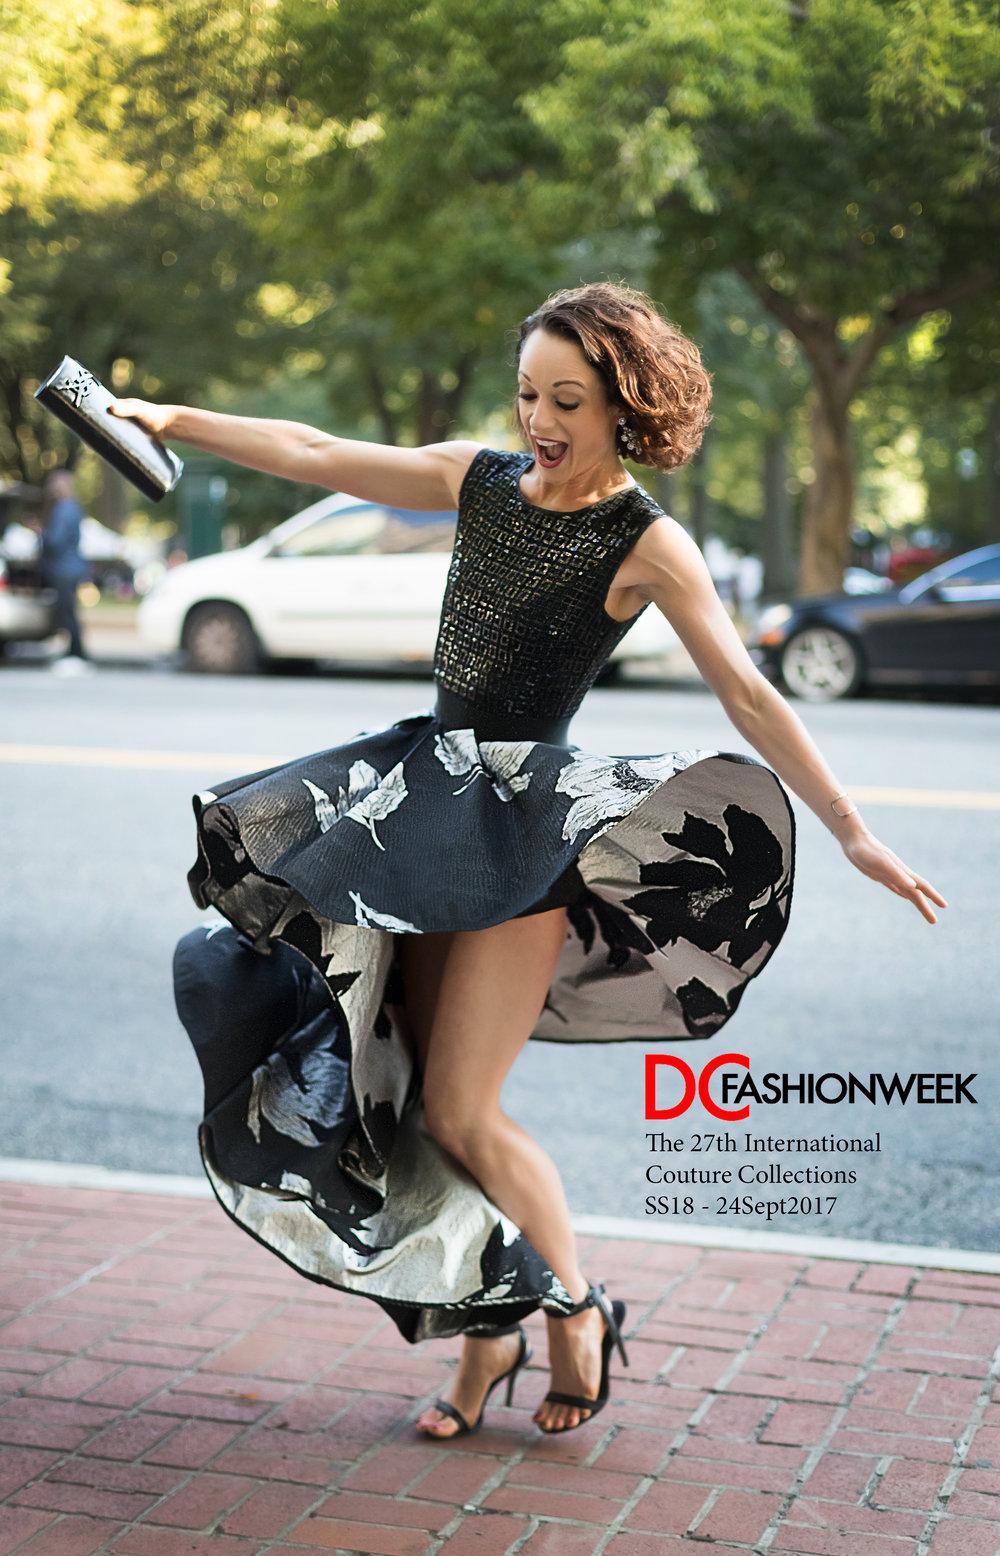 dc_fashion_week_AO9I8707.jpg